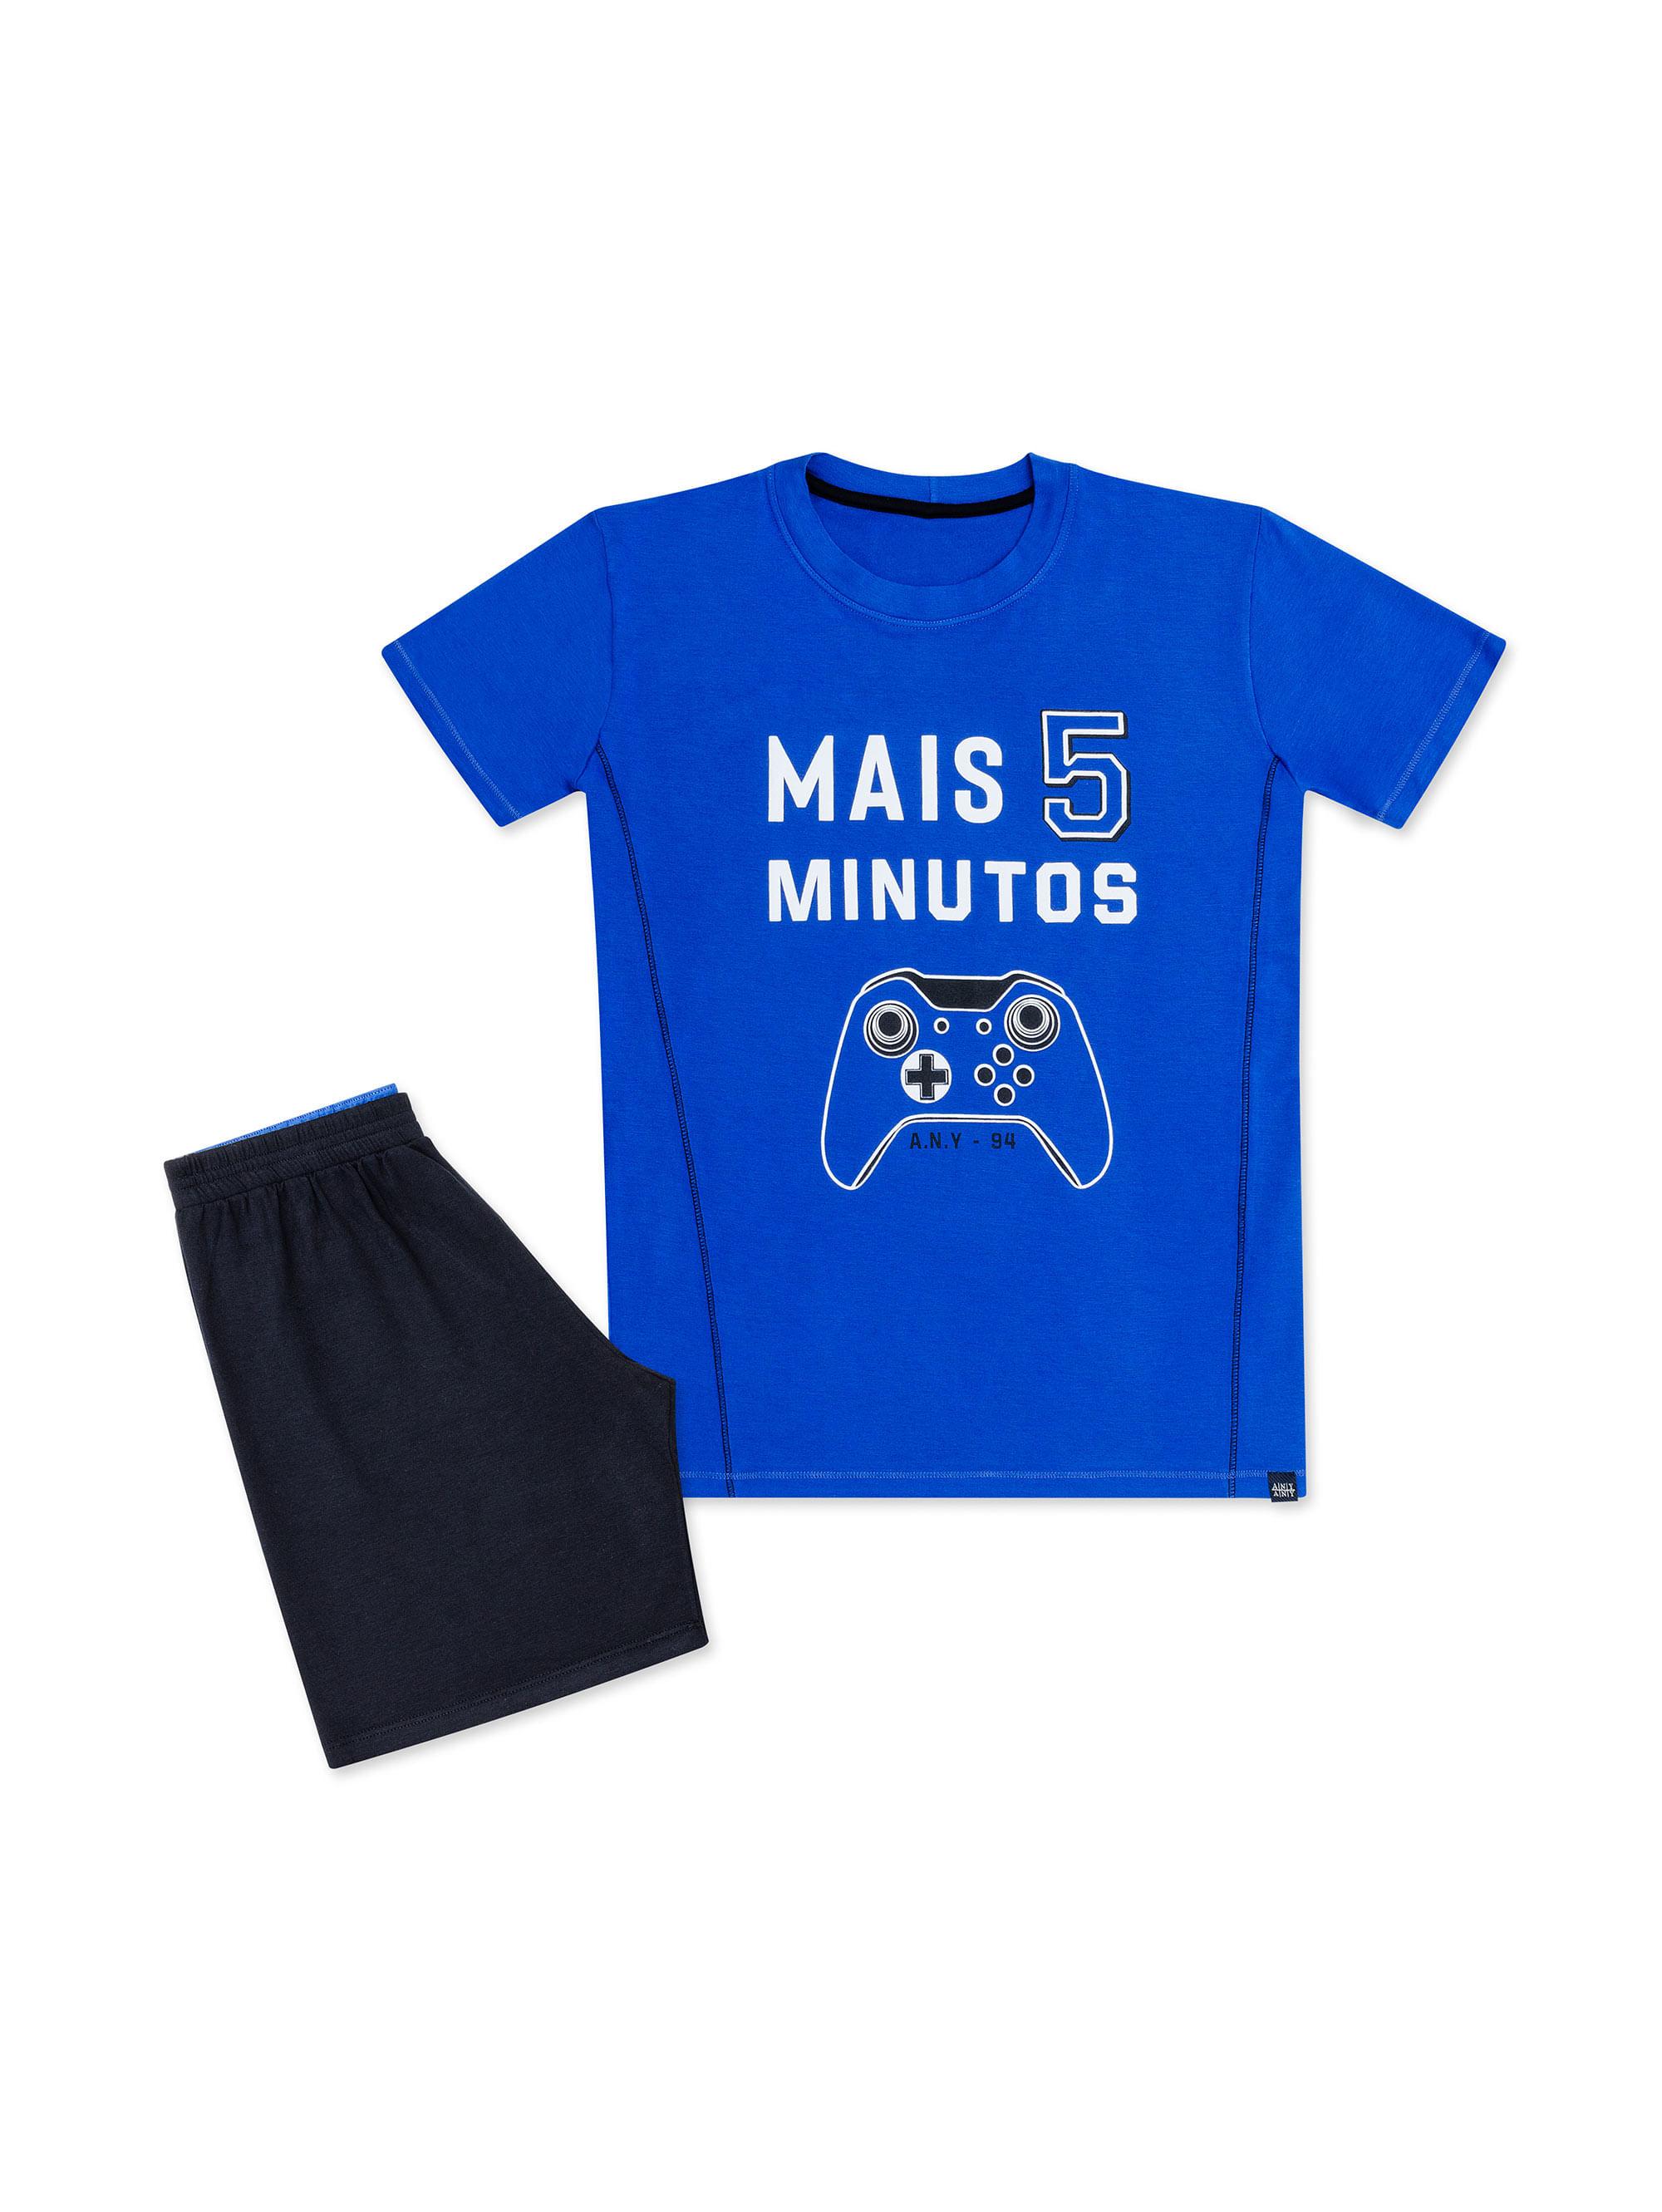 Pijama-Longo-Manga-Longa-Infantil-Masculino-Mais-5-Minutos-04.02.0741